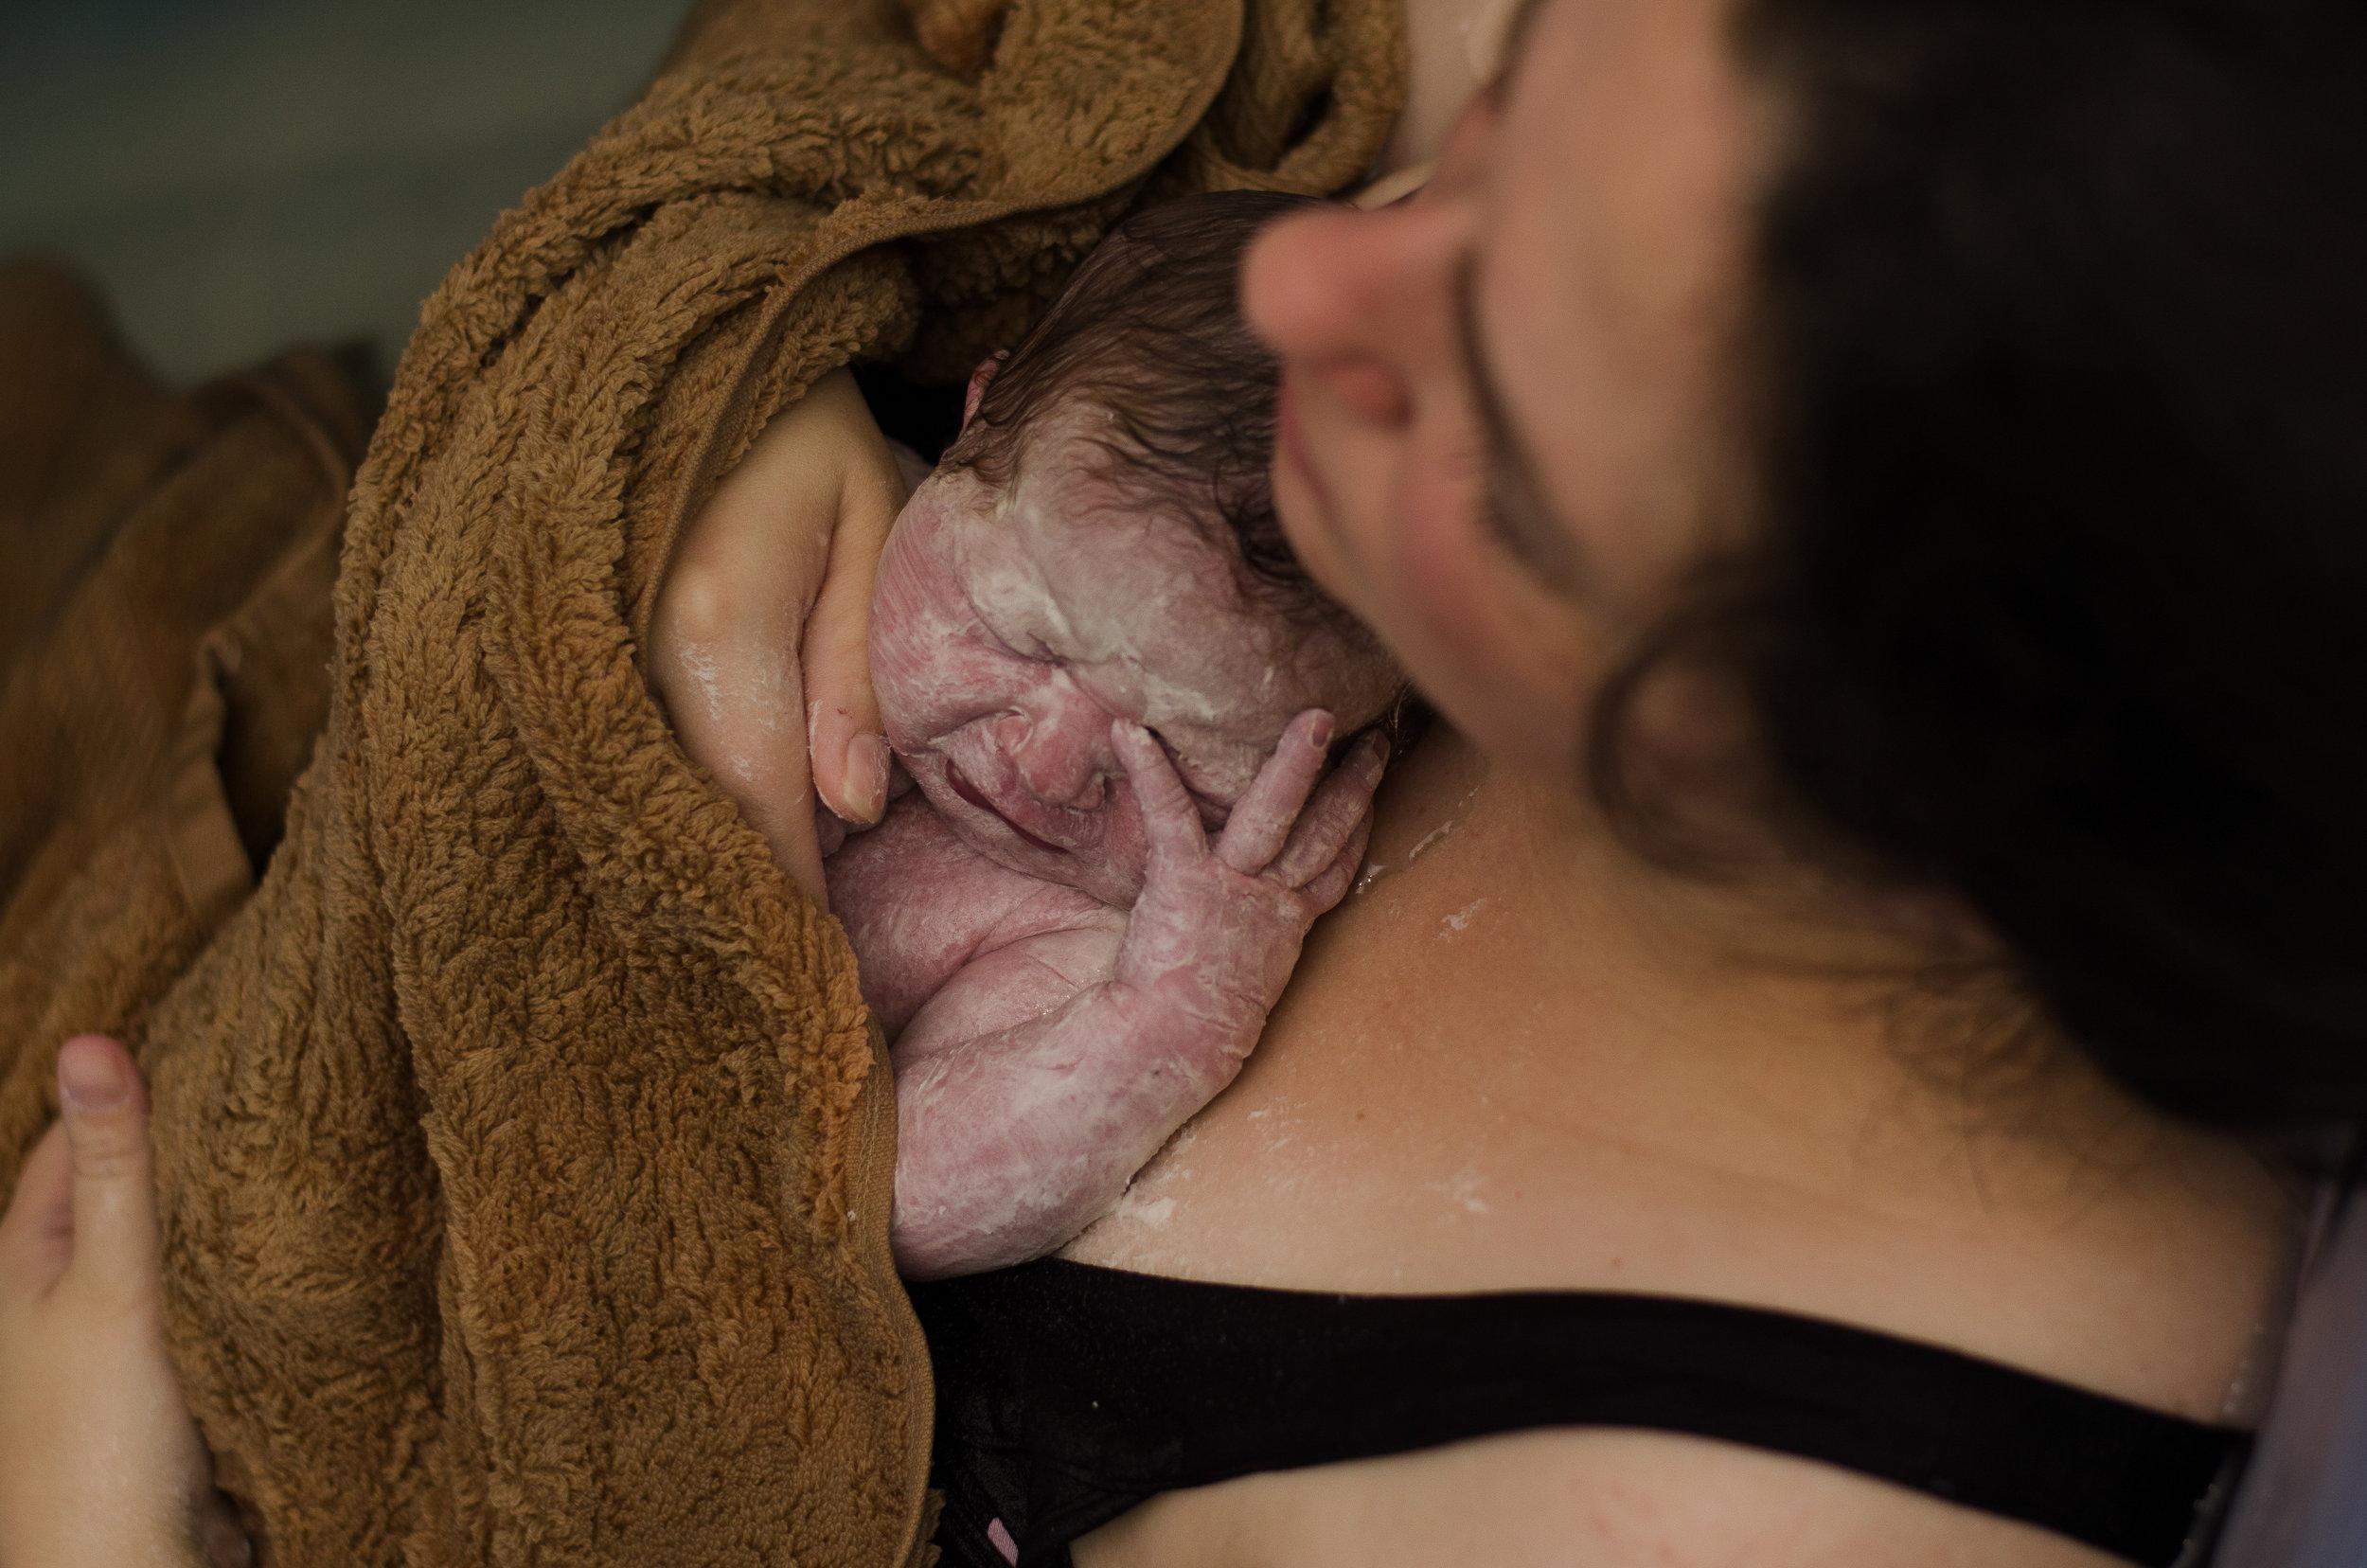 nashville tn home water birth photograpy